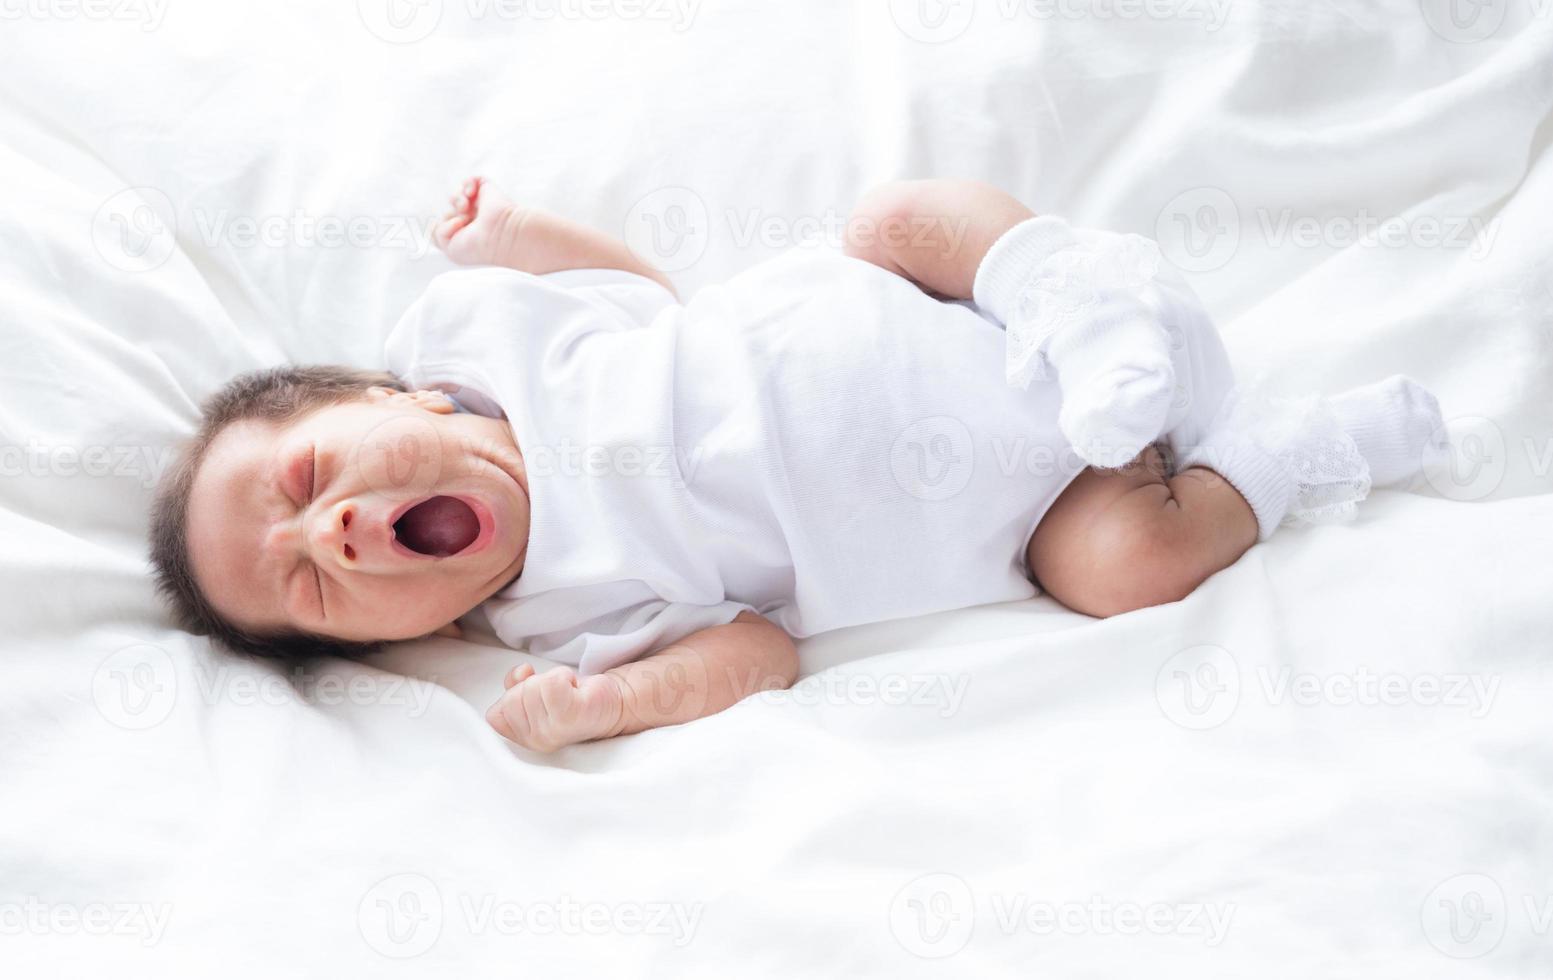 Asian baby photo